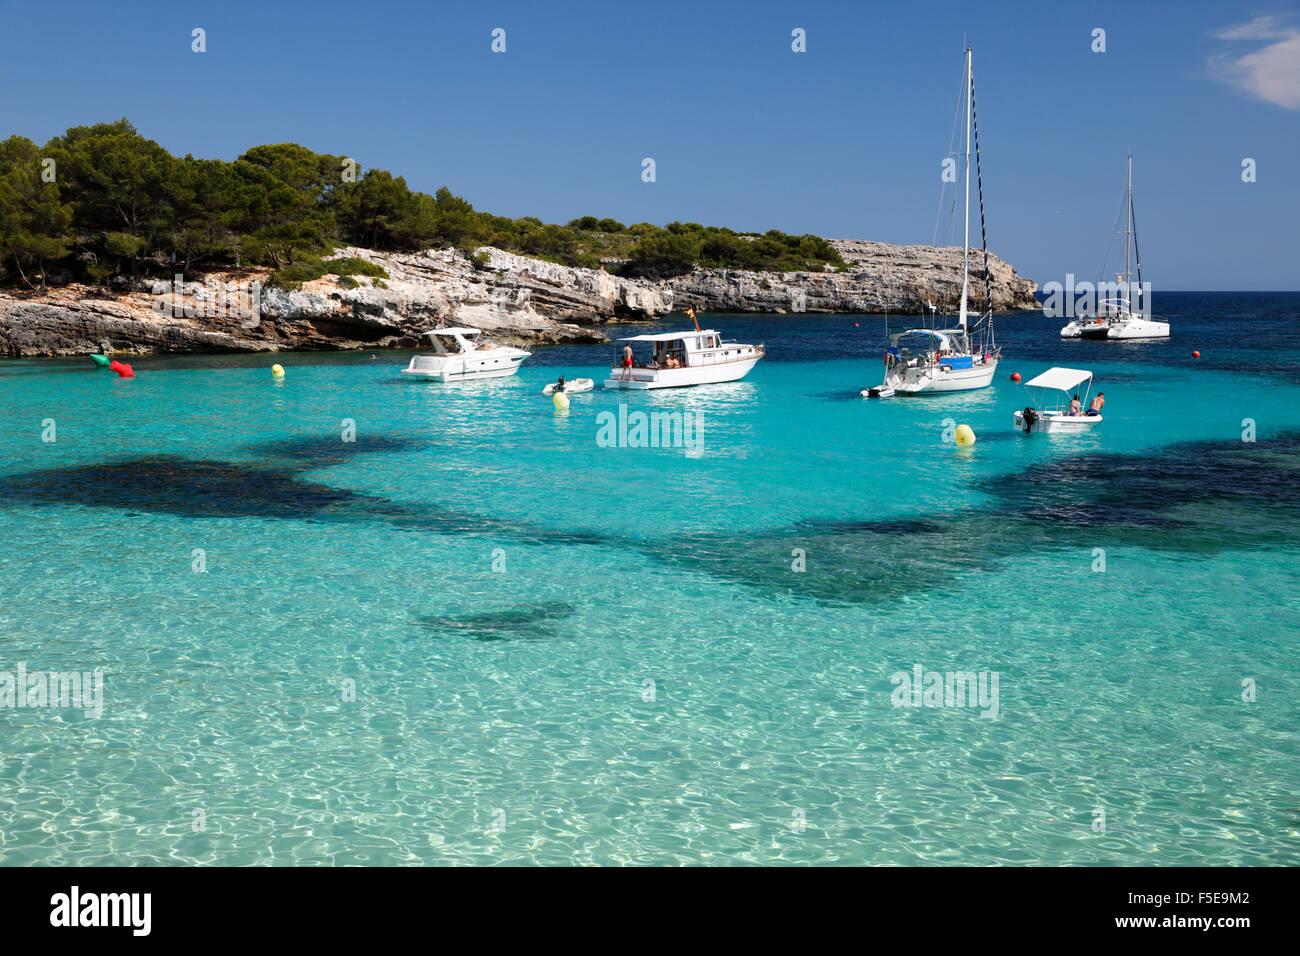 Cala en Turqueta, South West Coast, vicino a Ciutadella, Menorca, isole Baleari, Spagna, Mediterraneo, Europa Immagini Stock